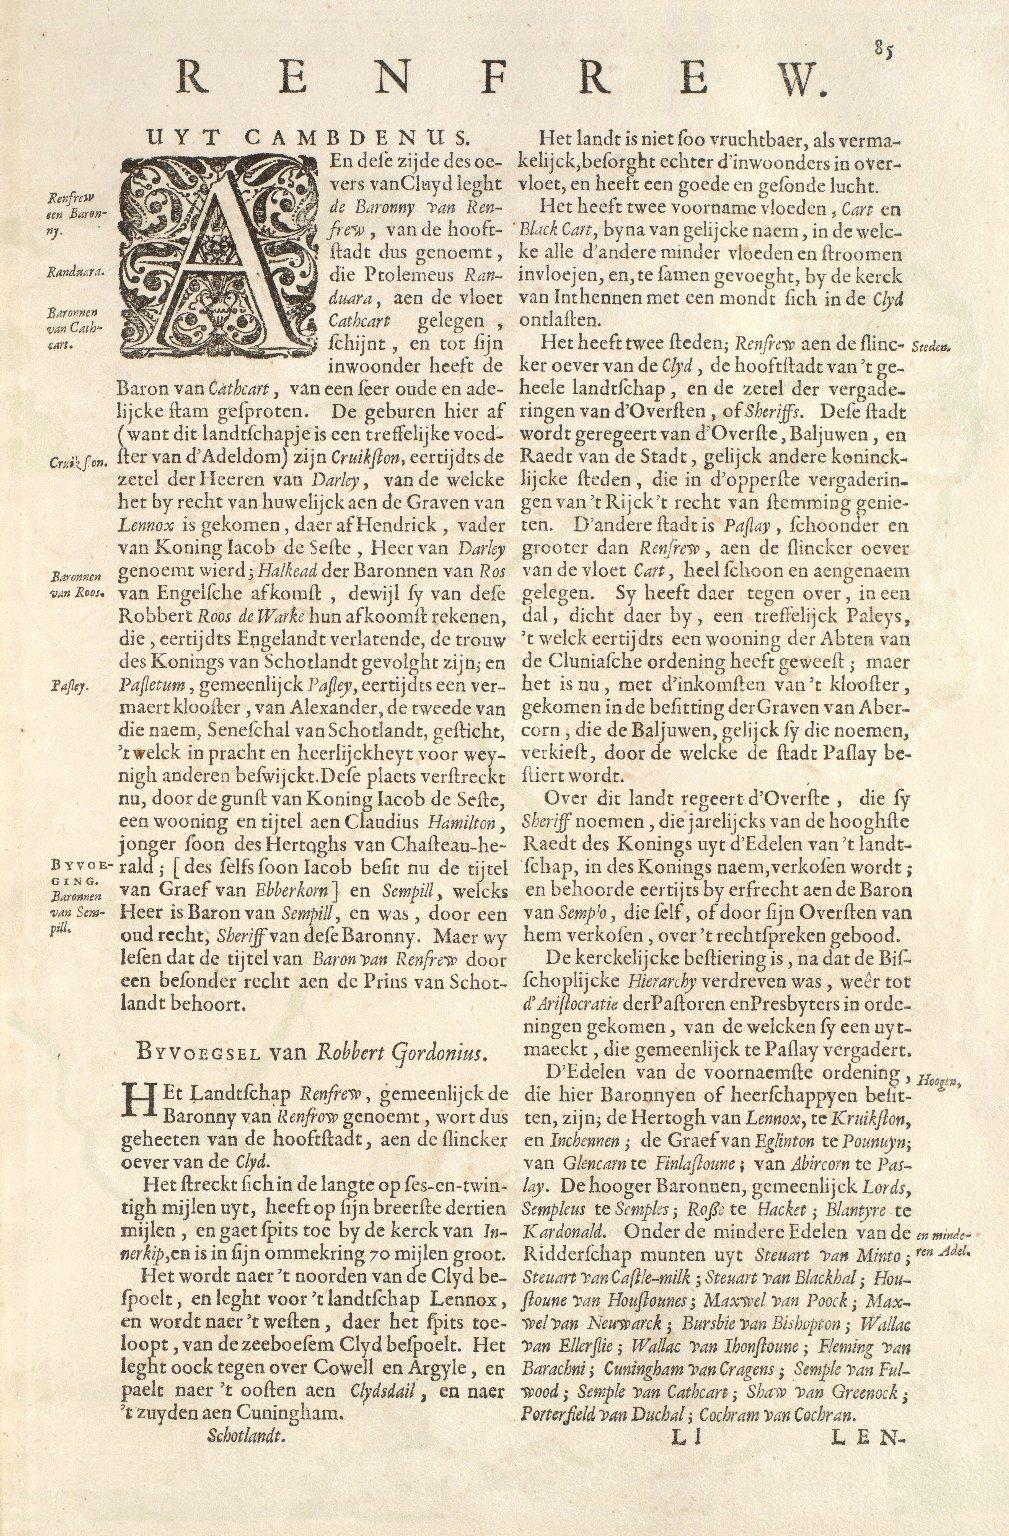 [Geographiae Blavianae] [Also known as: Atlas major] [077 of 153]